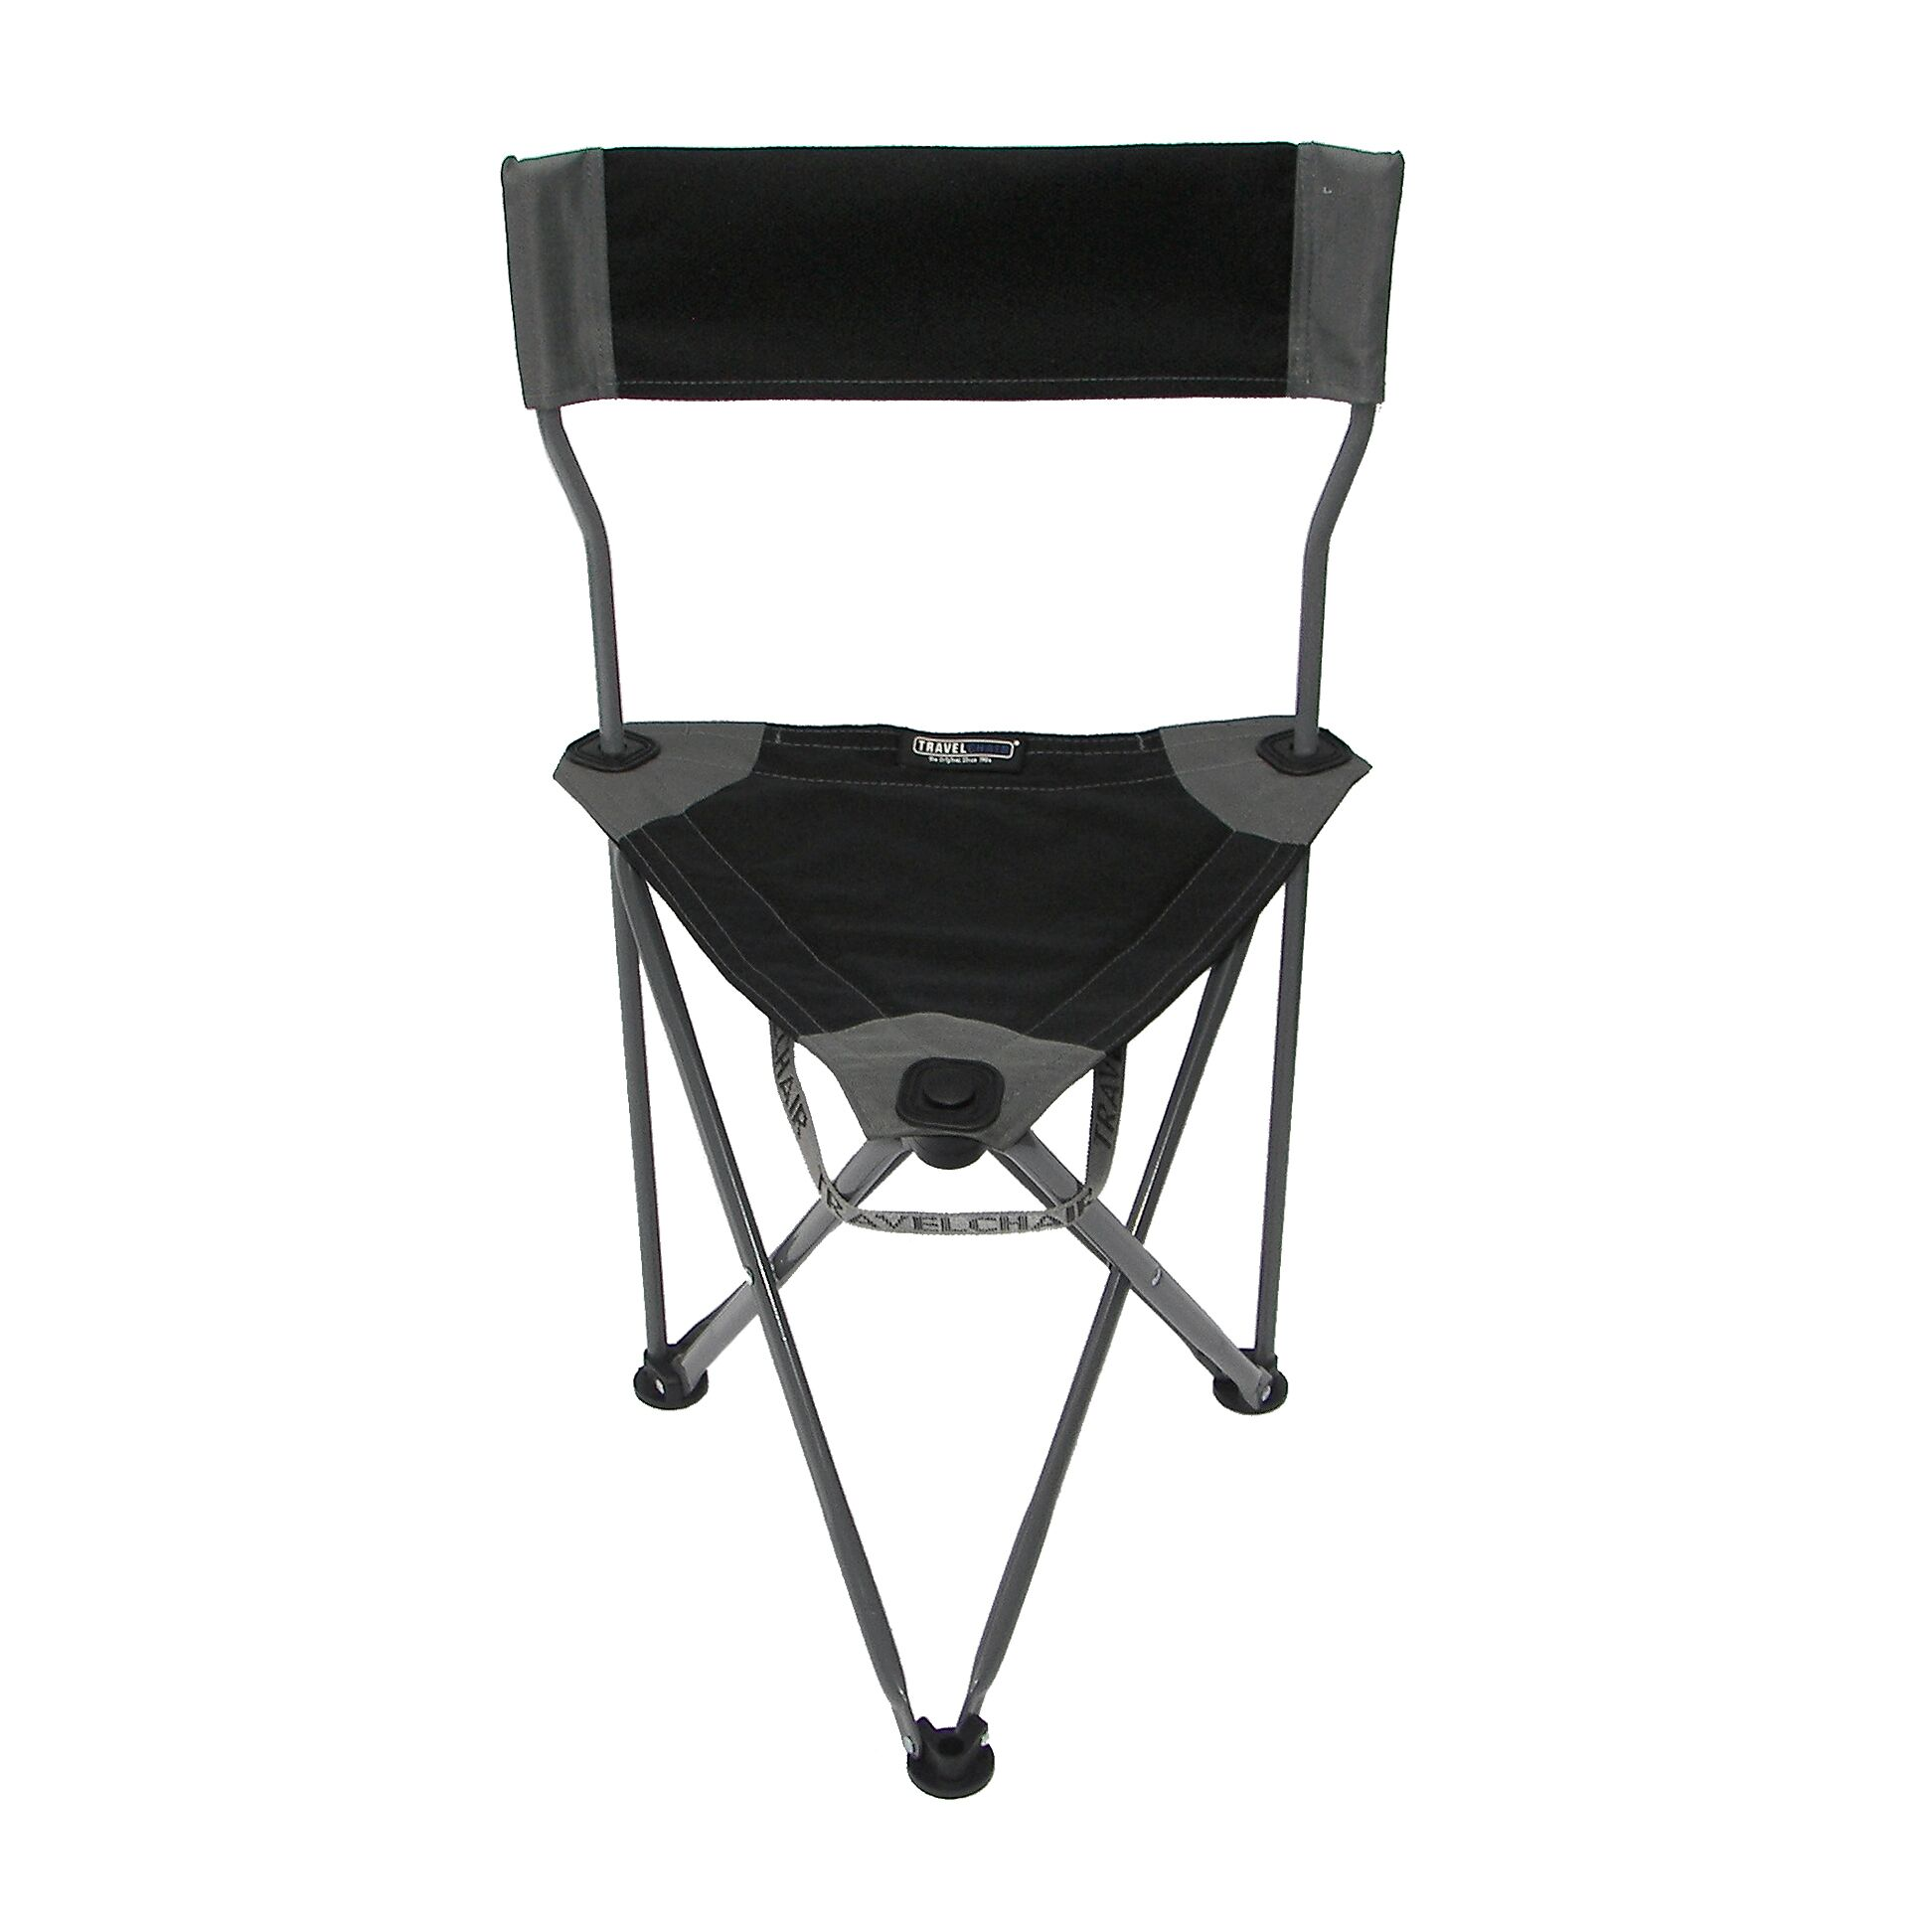 travel chair big bubba high back recliner chairs ultimate slacker 2 folding black